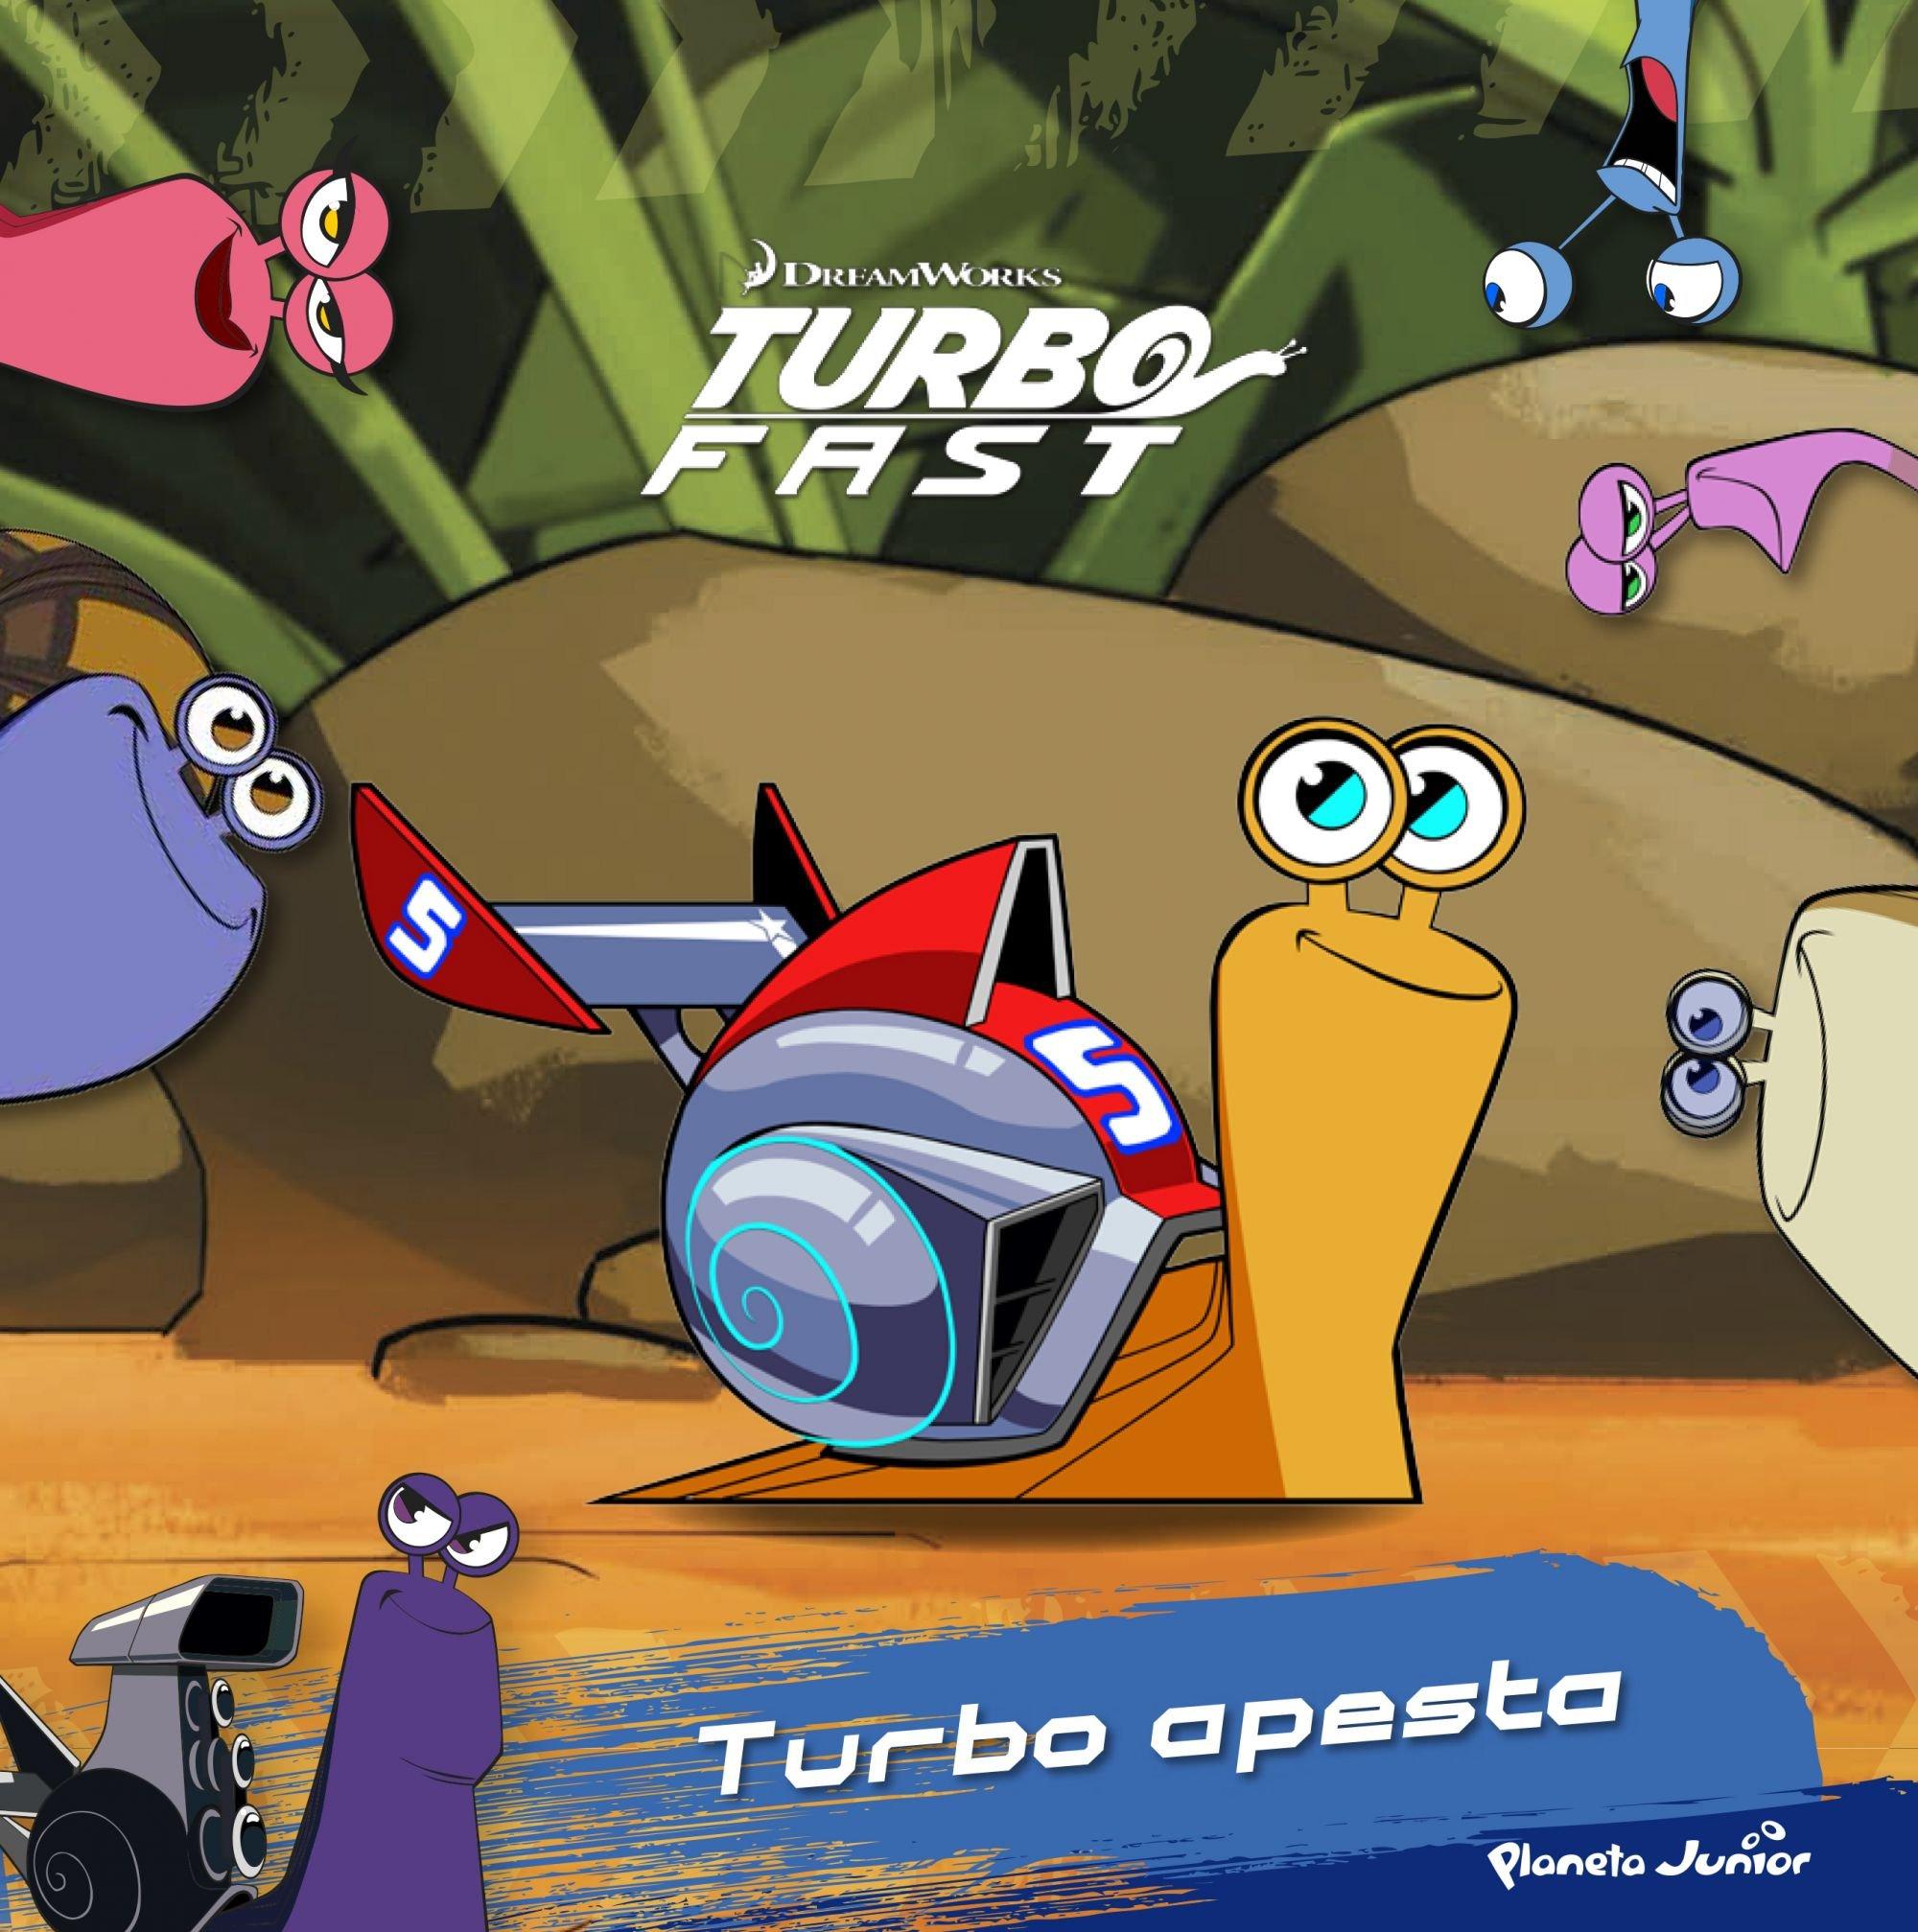 Turbo Fast. Turbo apesta (Spanish) Hardcover – January 1, 2016